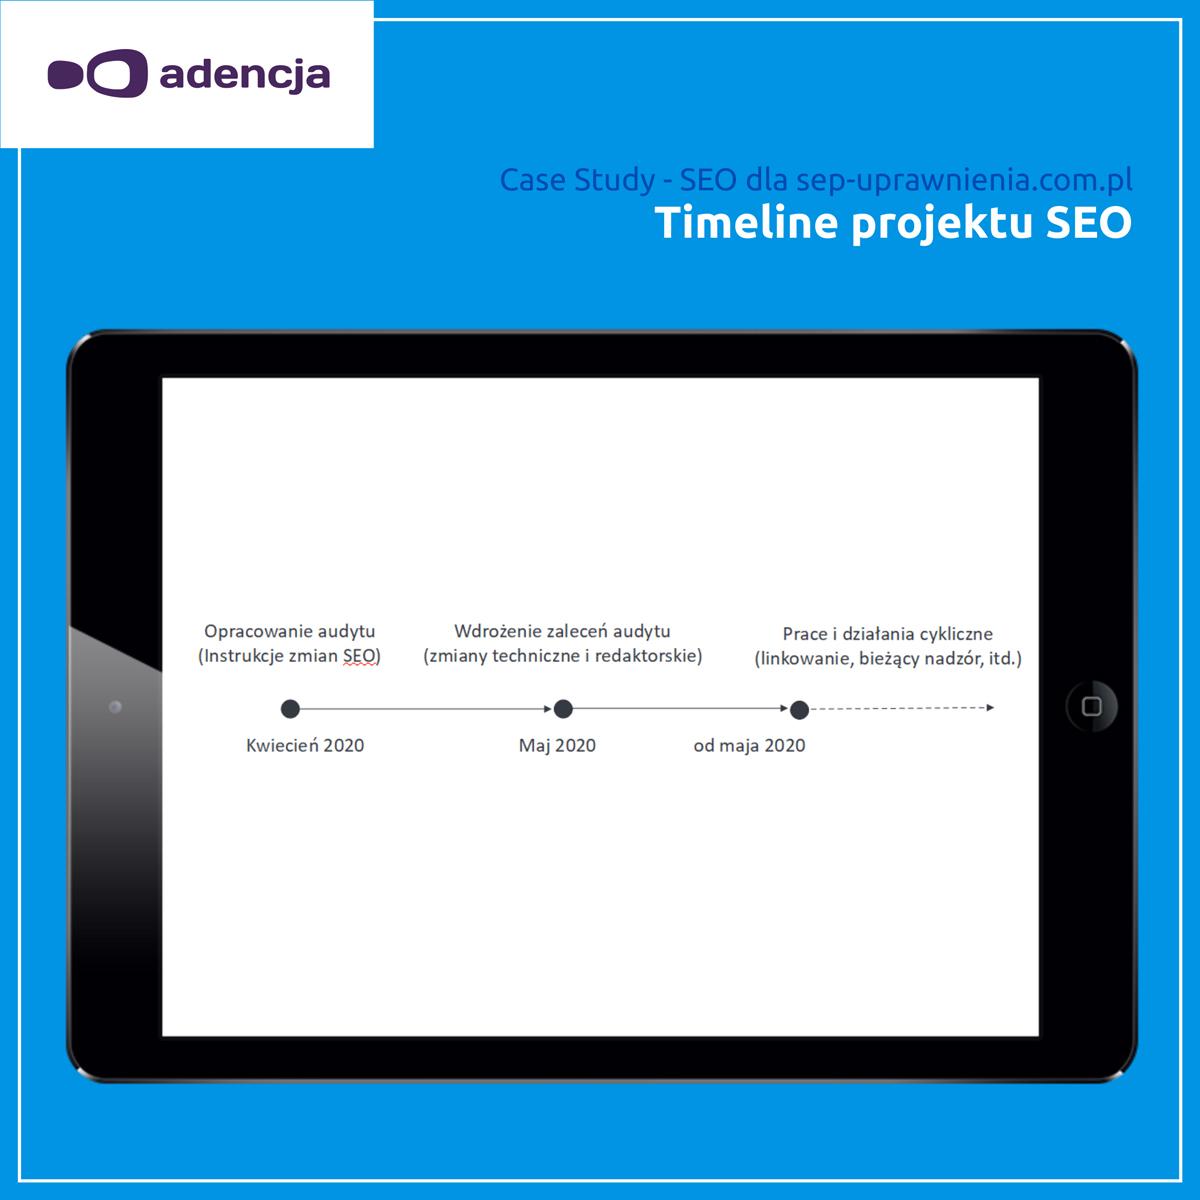 Timeline projektu SEO